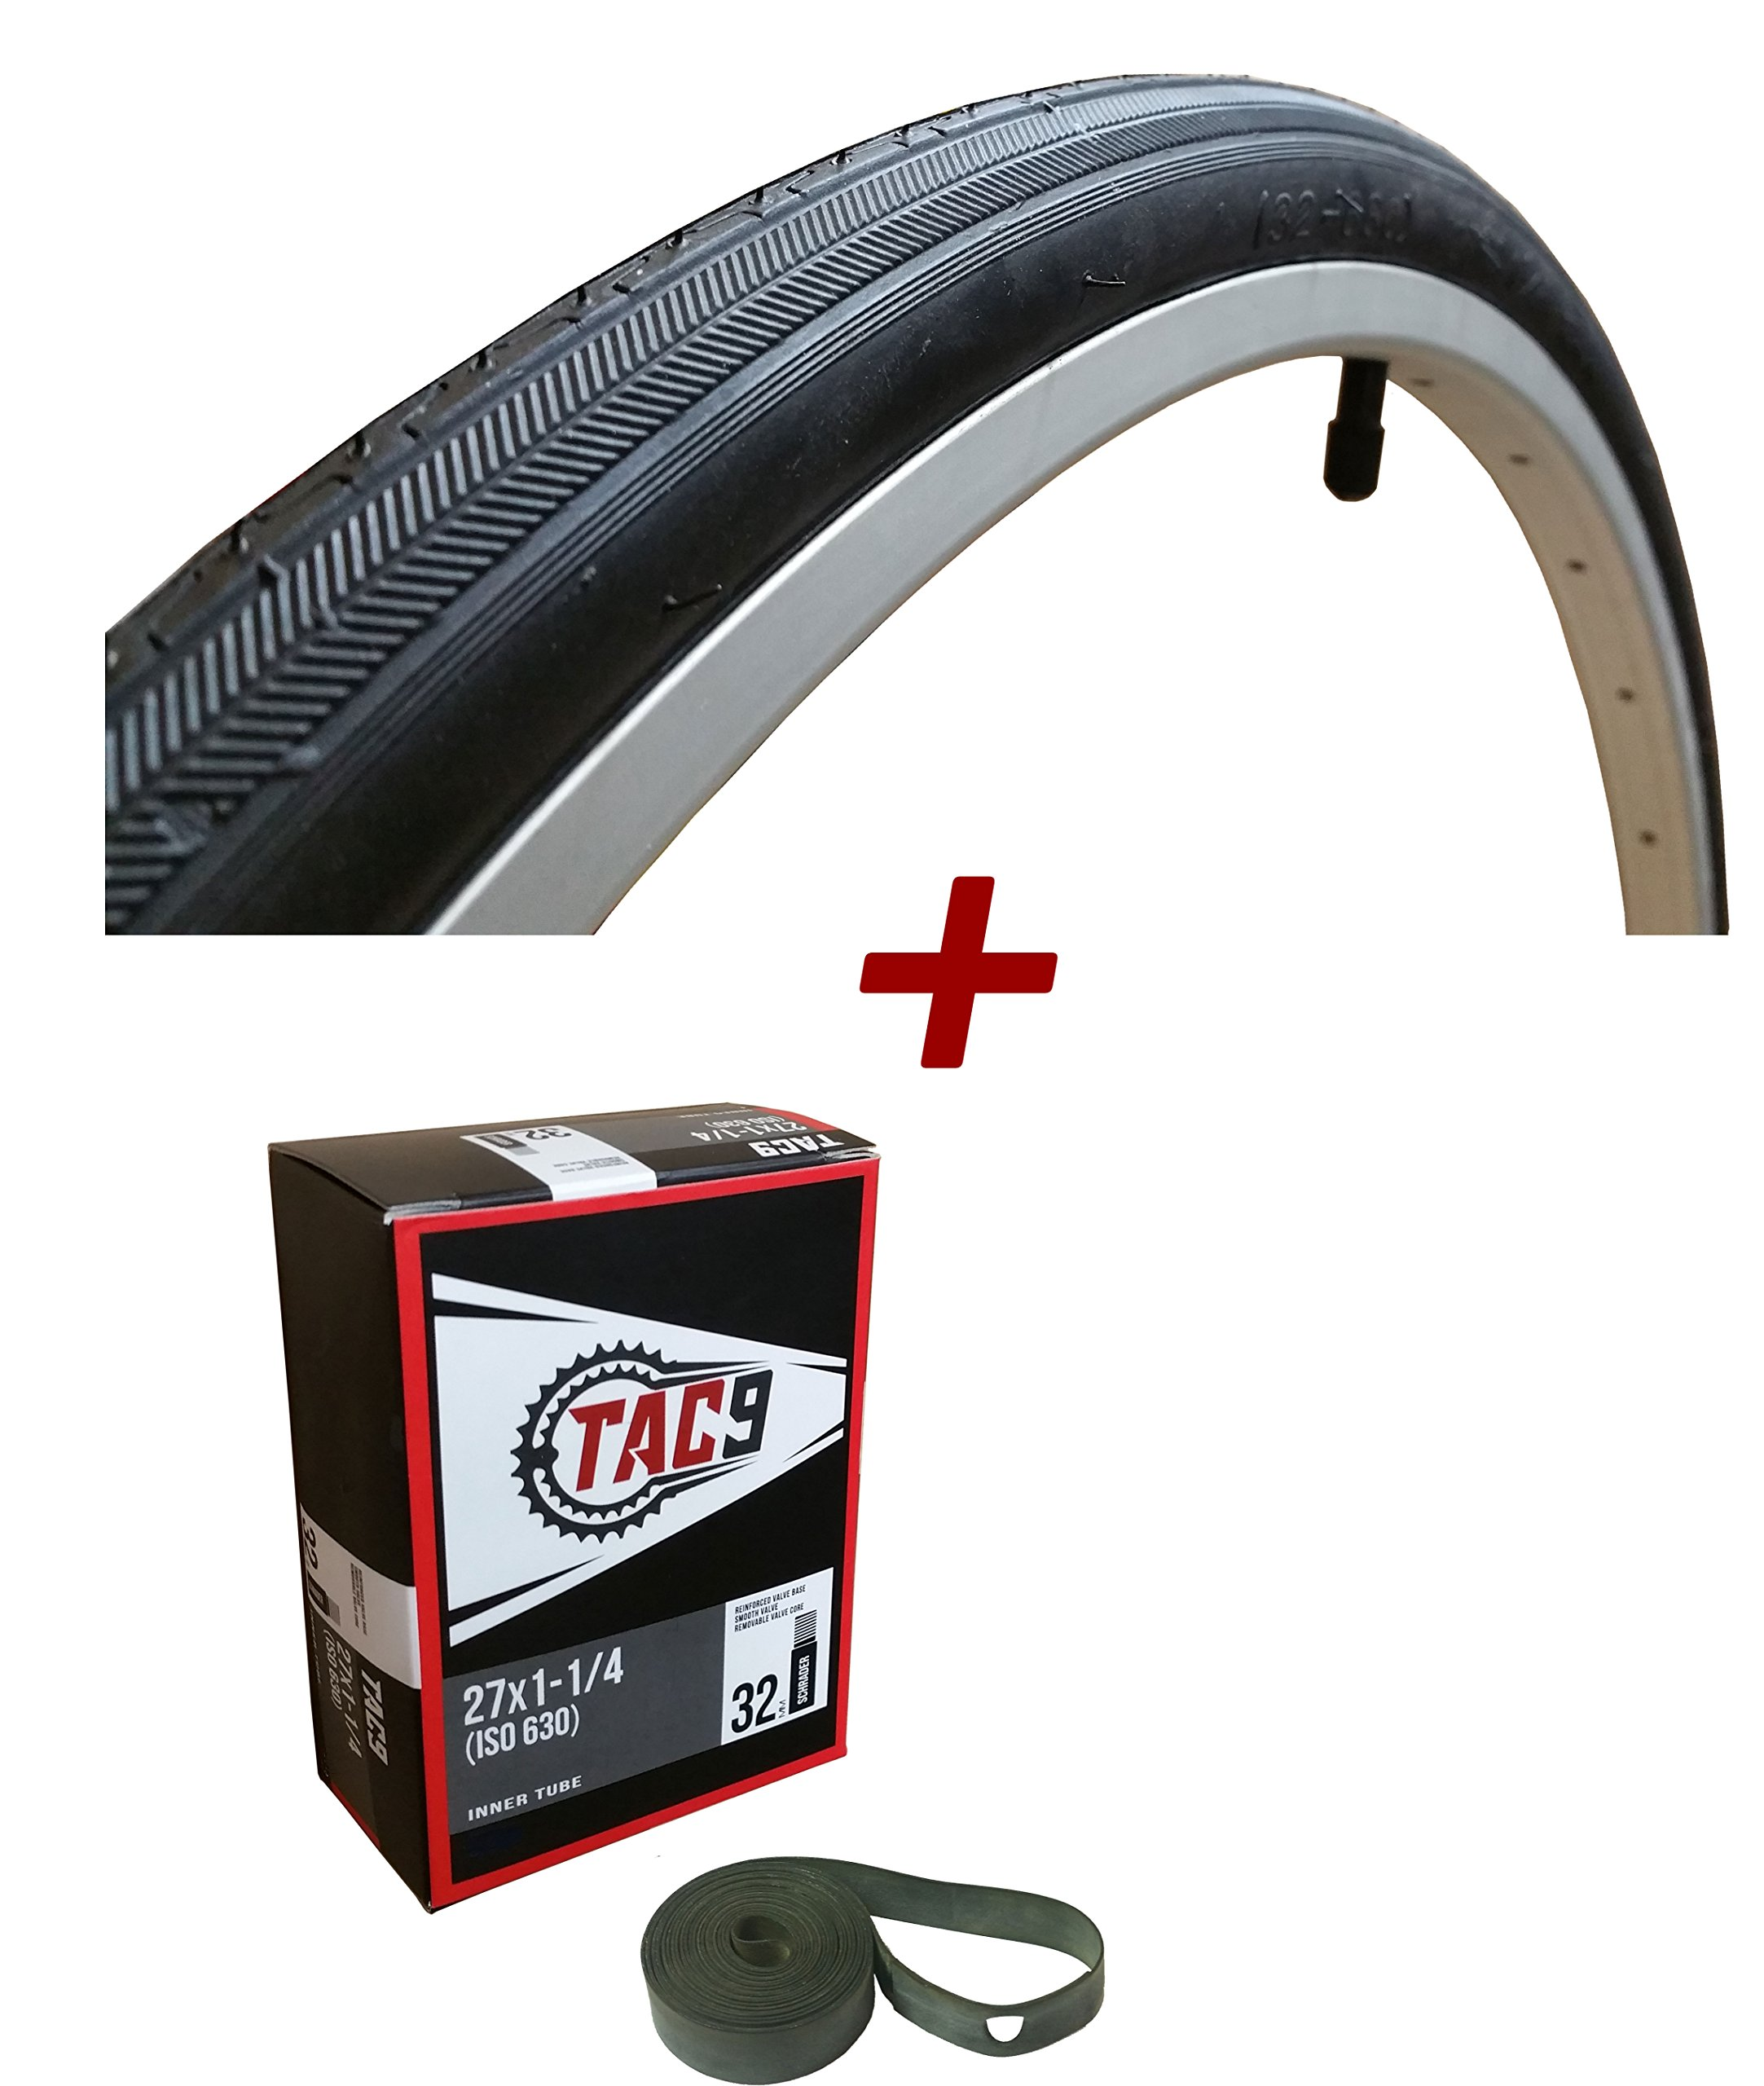 TAC 9 - 27x1-1/4 Bike Tire, Bonus Tube and Rim Strip - Select Gum Wall or Black Wall